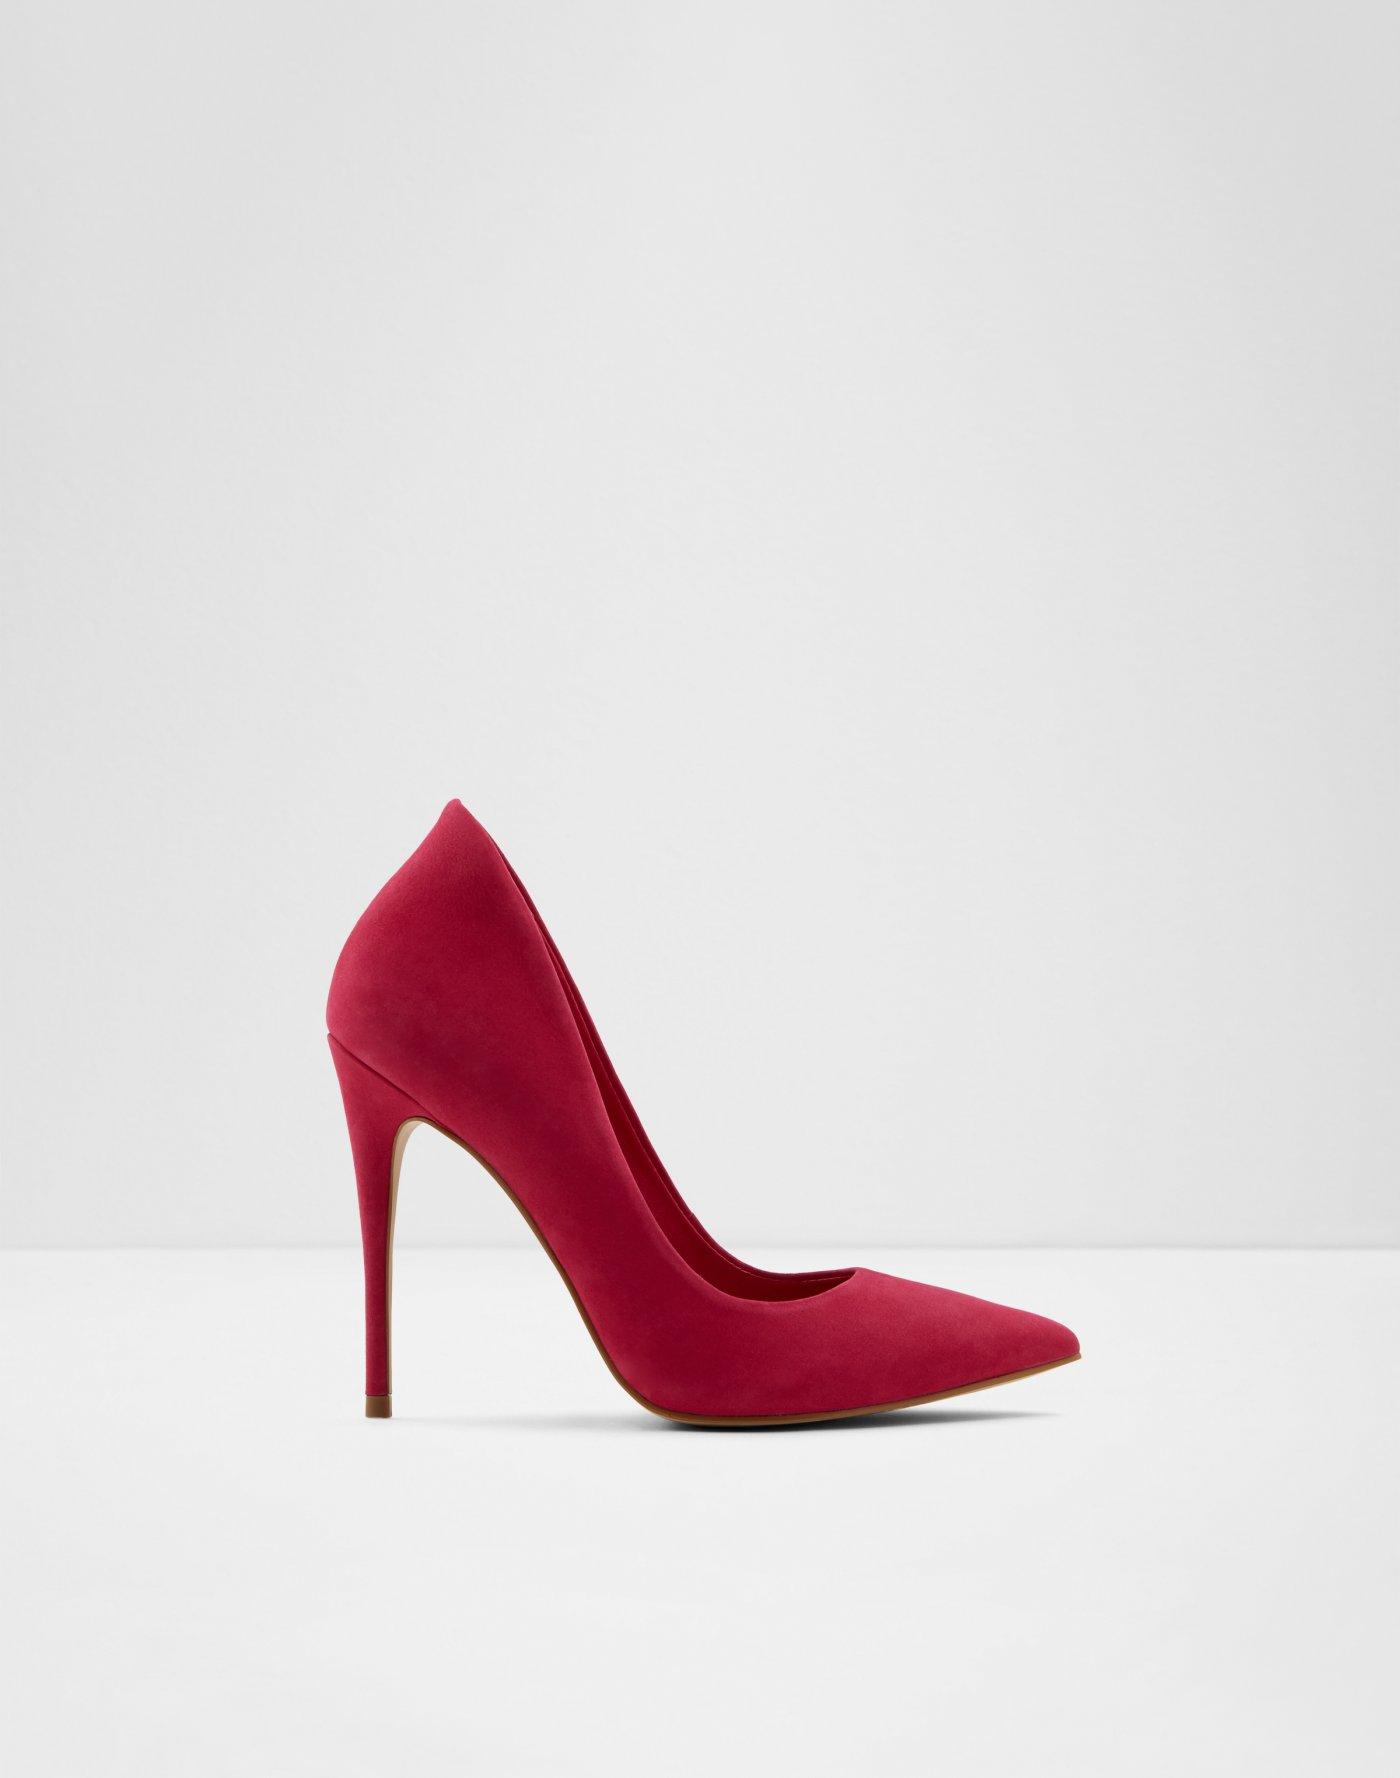 dc426d3382b ALDO Shoes Aldo Wedge Heel Color BlackWhite Size 6 in